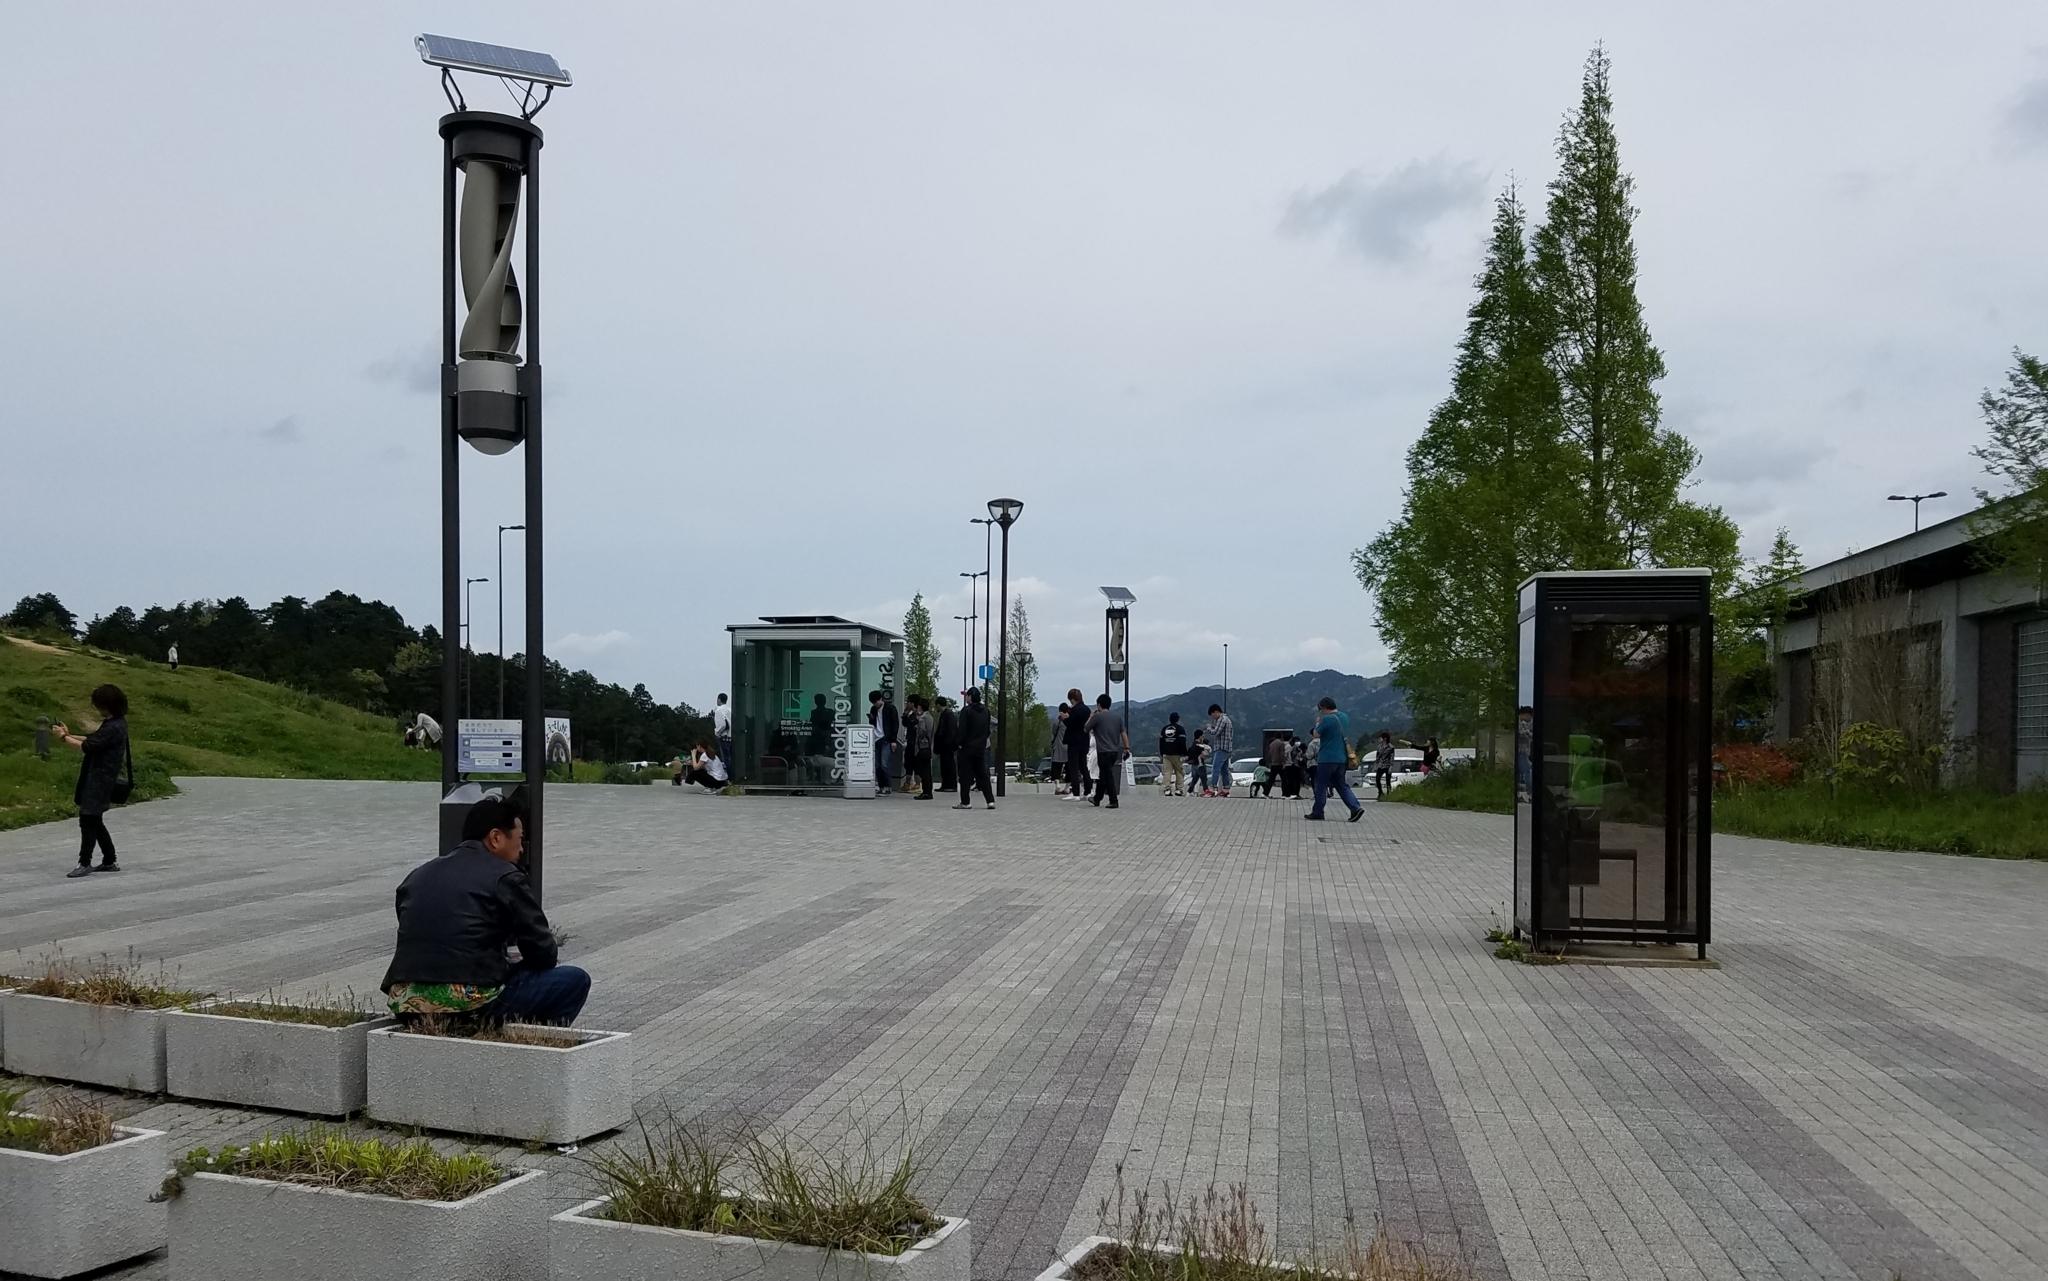 f:id:ToshUeno:20170503102852j:plain